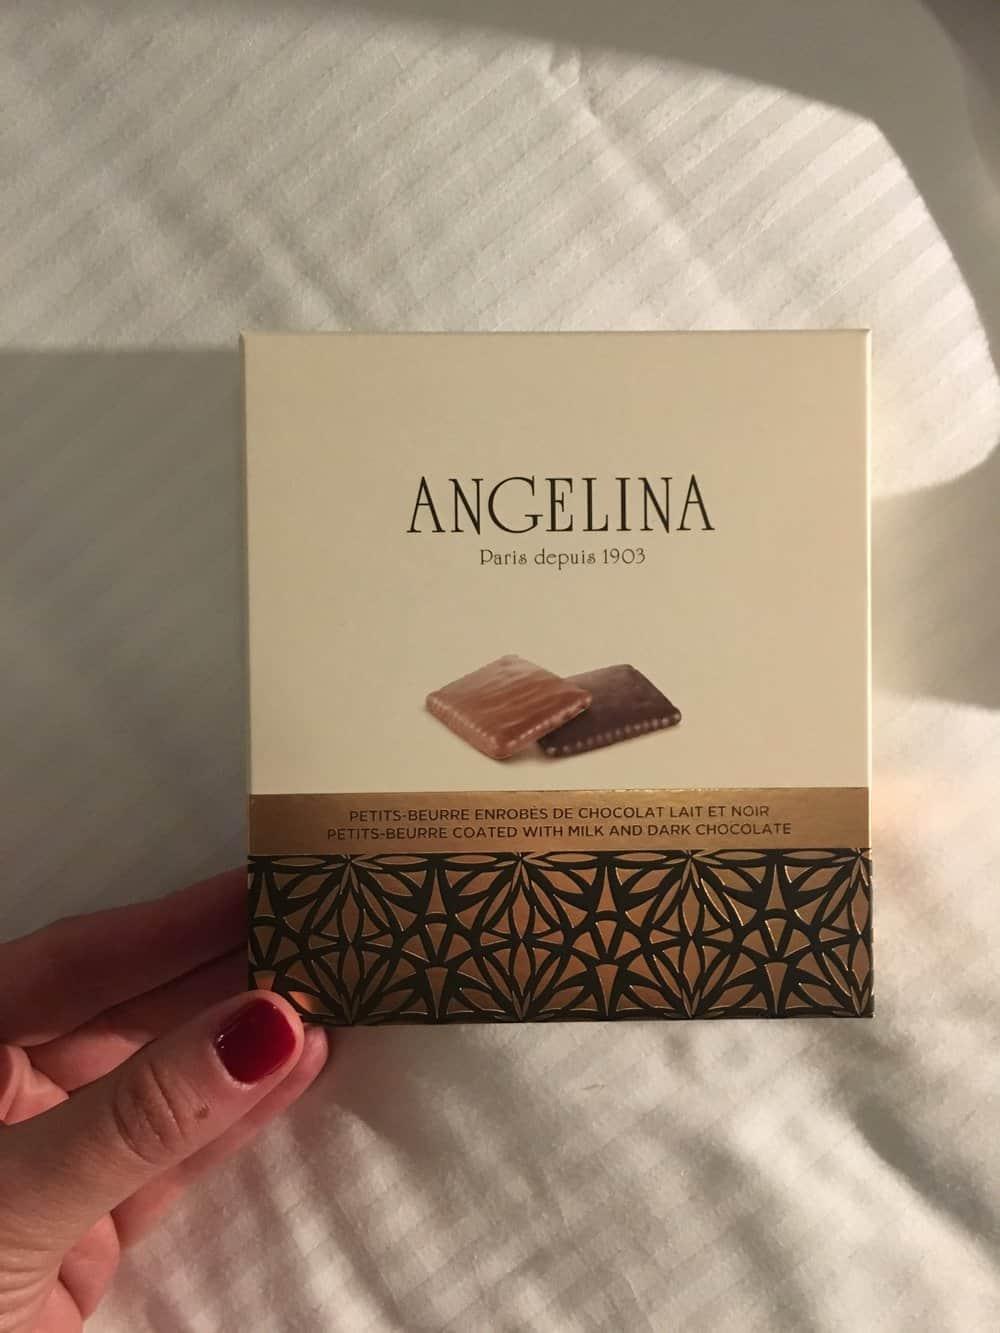 angelina chocolates le cinq codet